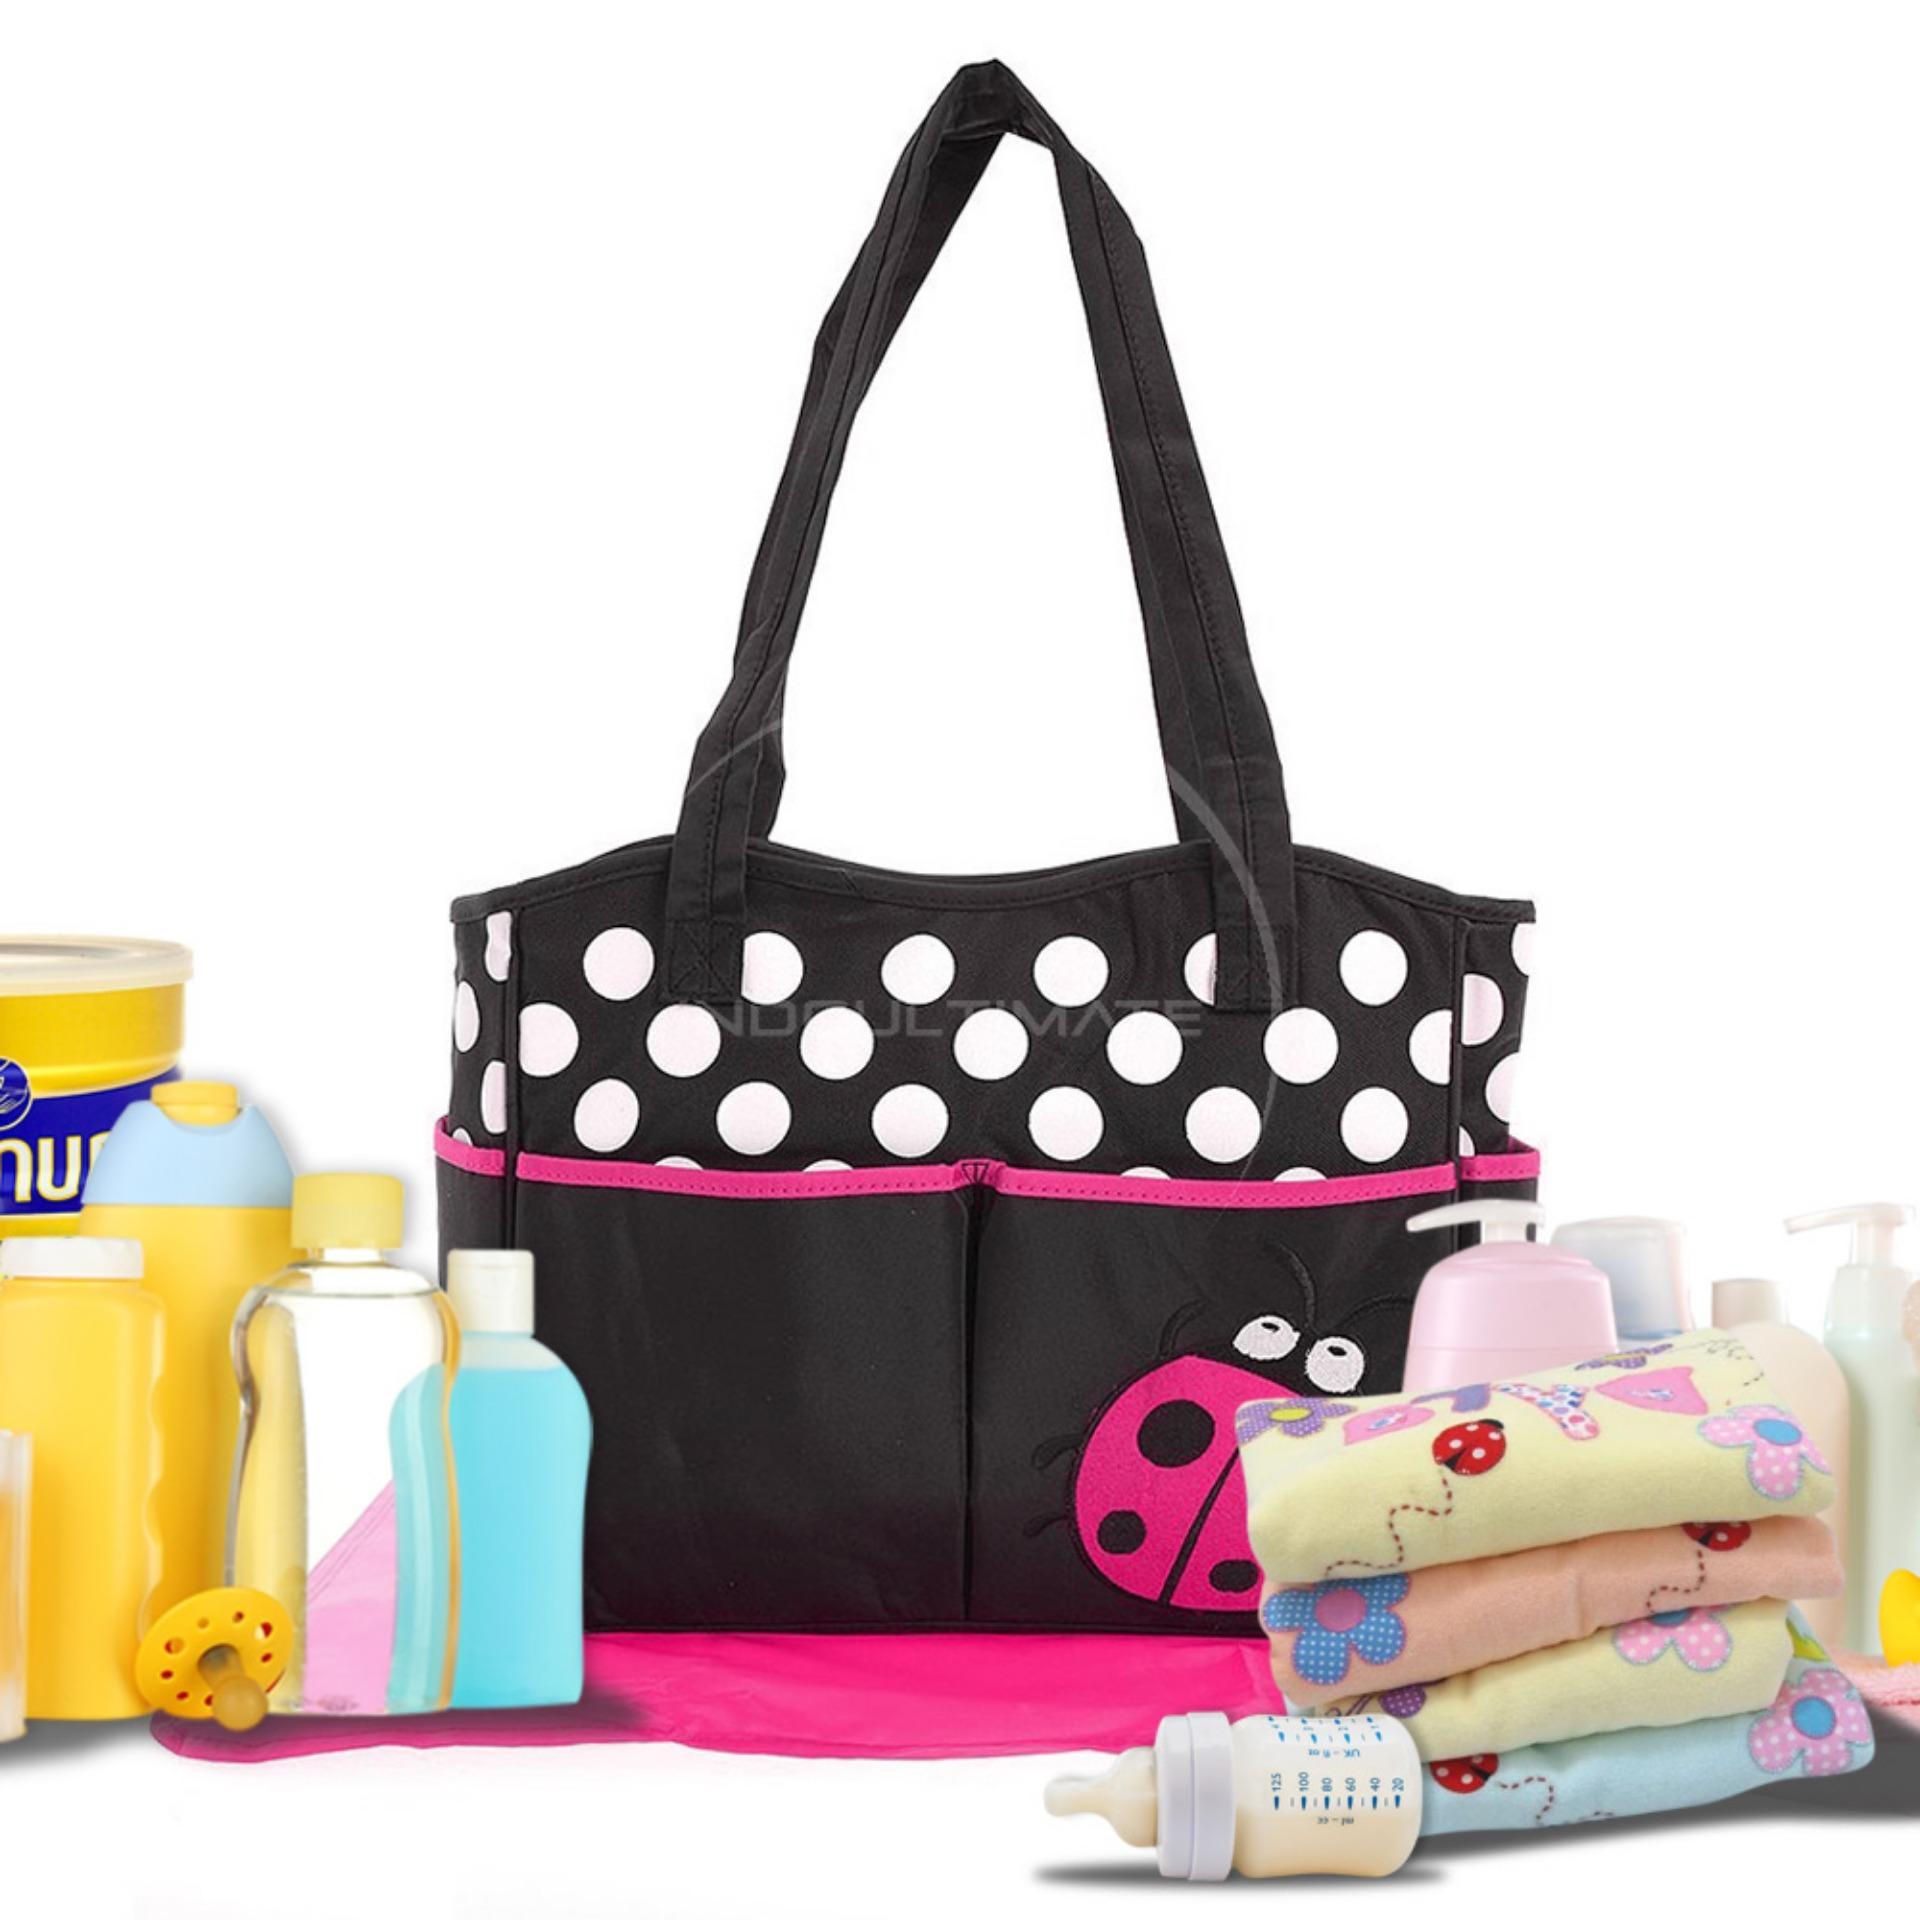 Harga Premium Waterproof Tas Bayi Besar 4 Saku Extra Free Alas Tas Baby Tas Diapers Susu Perlengkapan Bayi Baby Diaper Bag By 02 Lady Bug Pink Ultimate Original